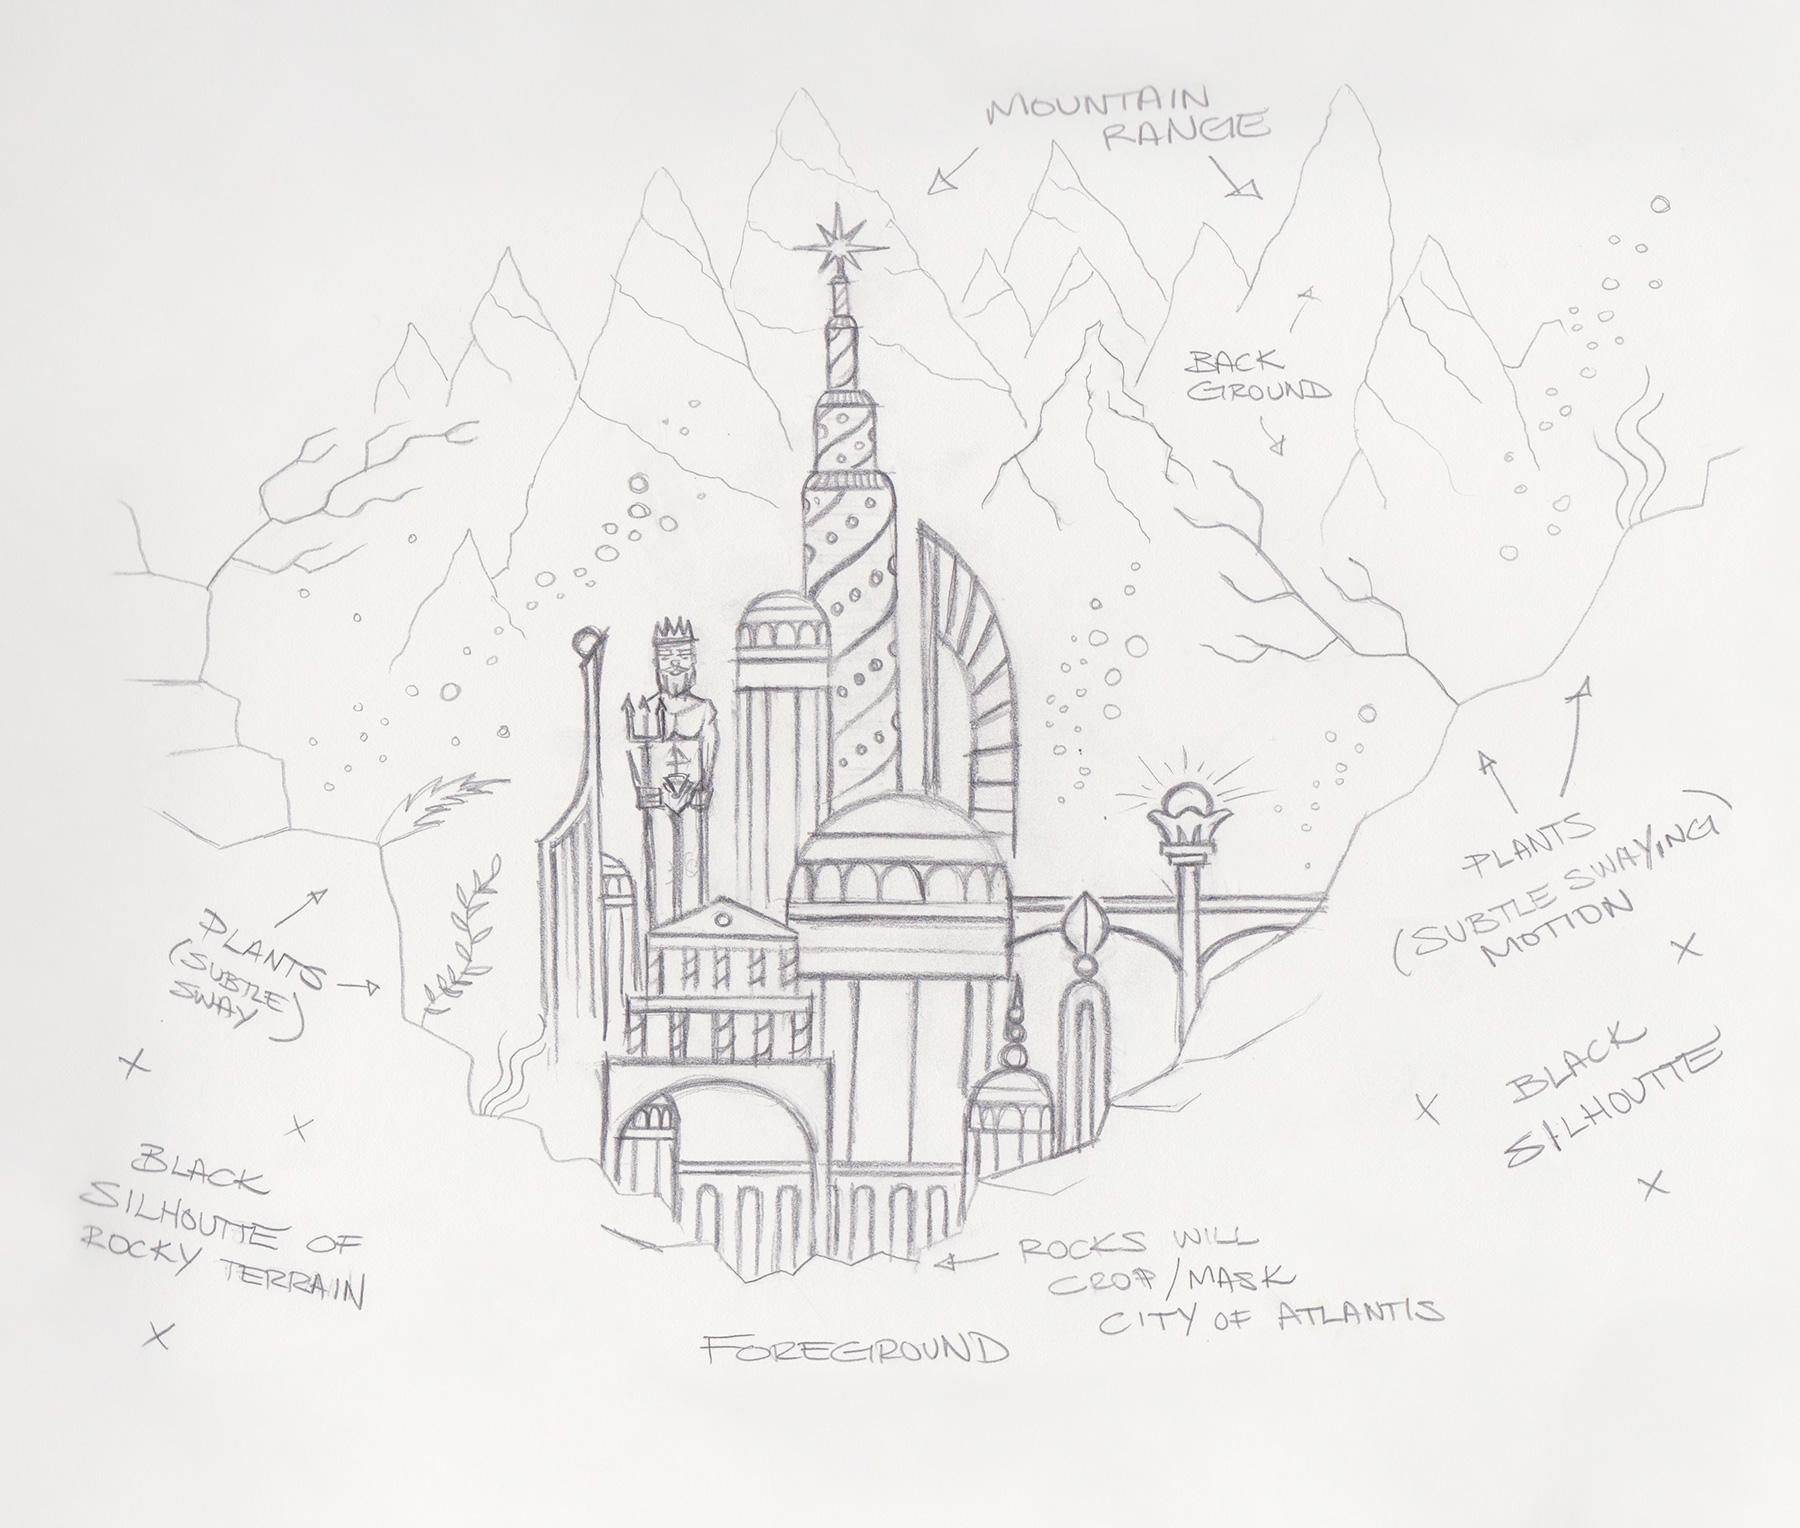 Atlantis-Sketch-Post.jpg